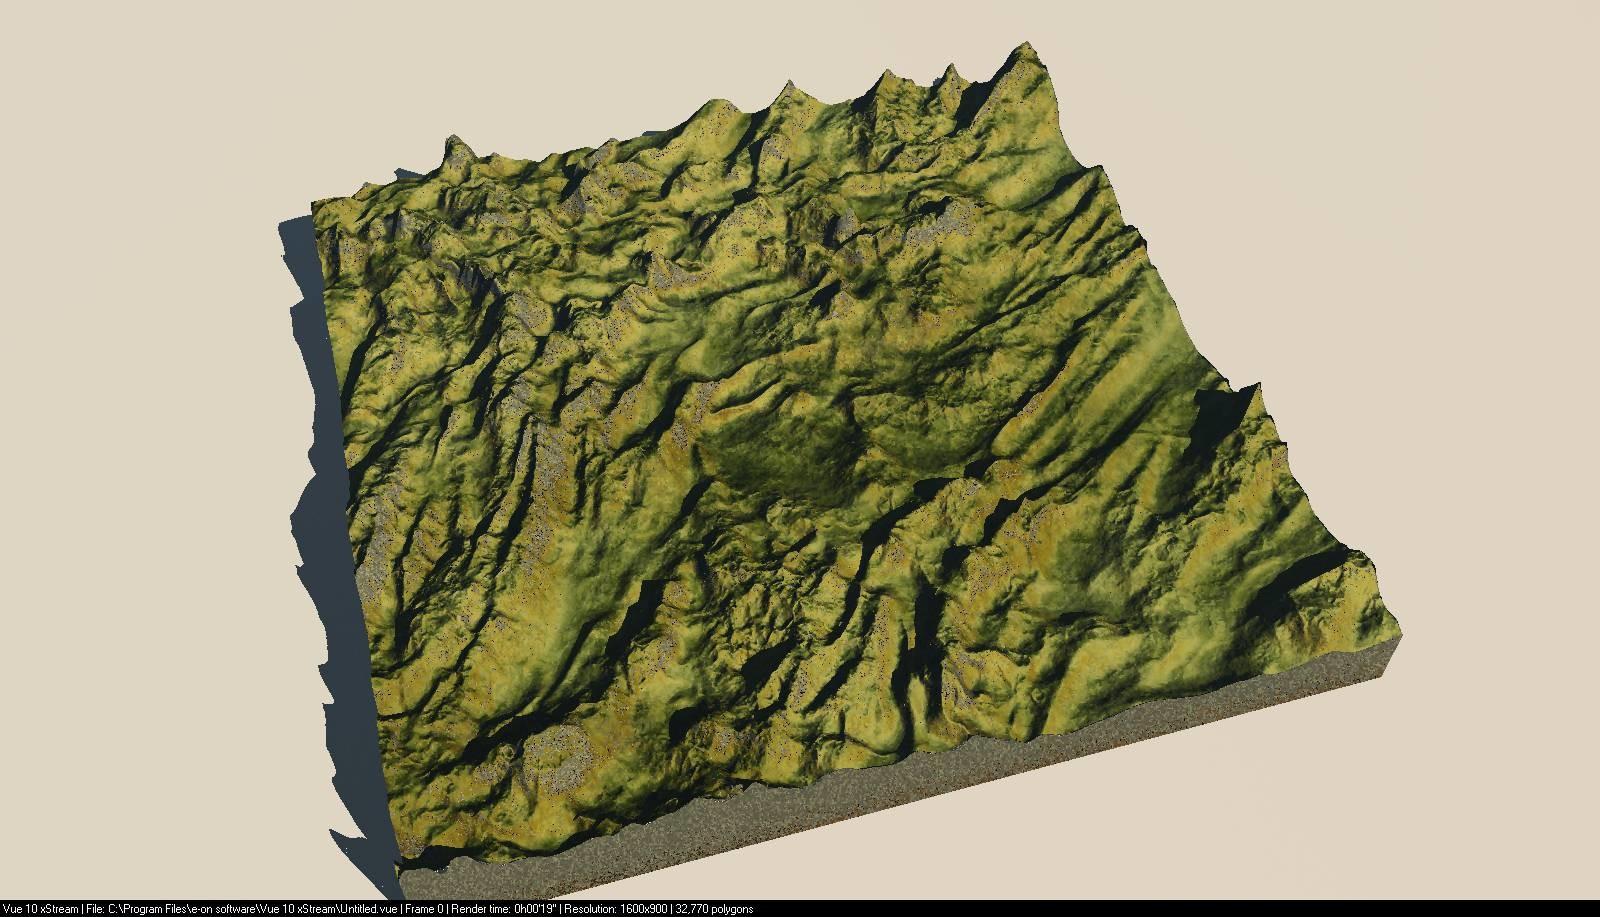 Denis Mukhanovsky - Terrain generation study